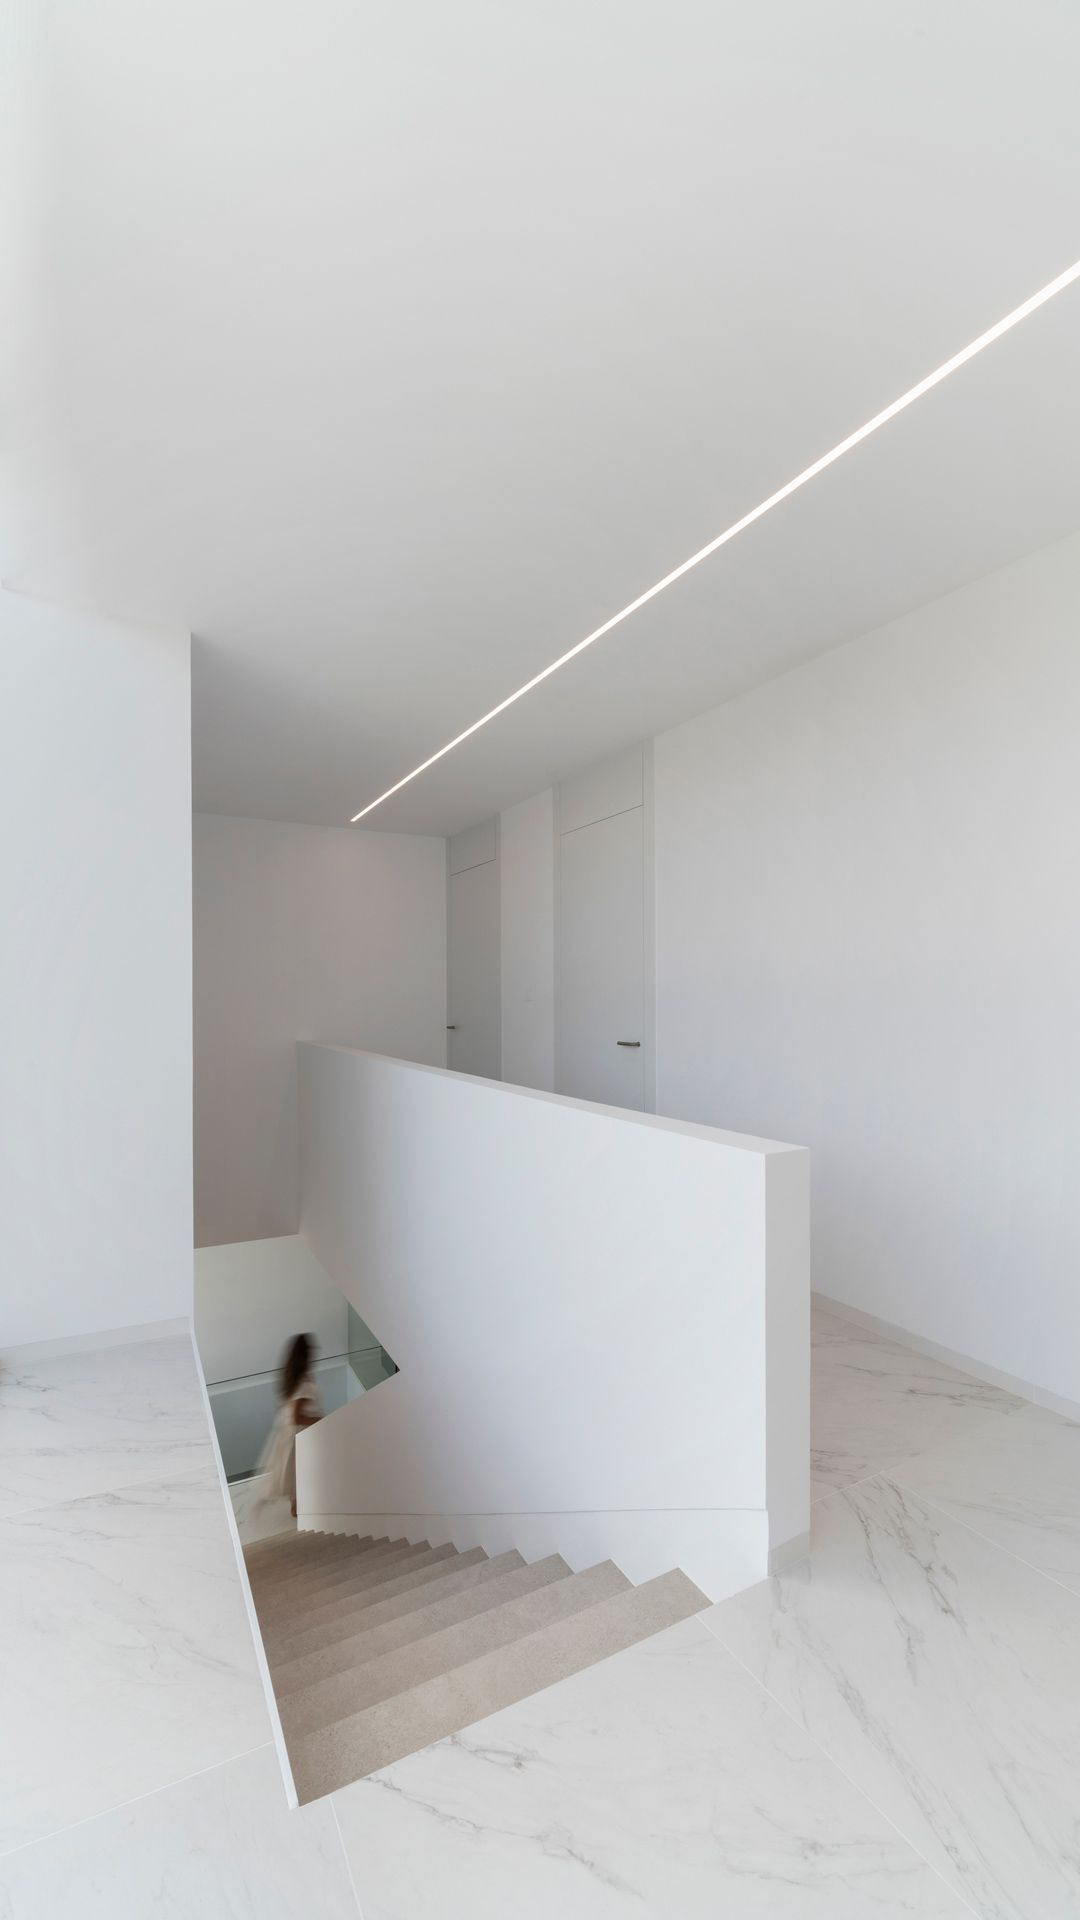 Bright Line - Arkoslight